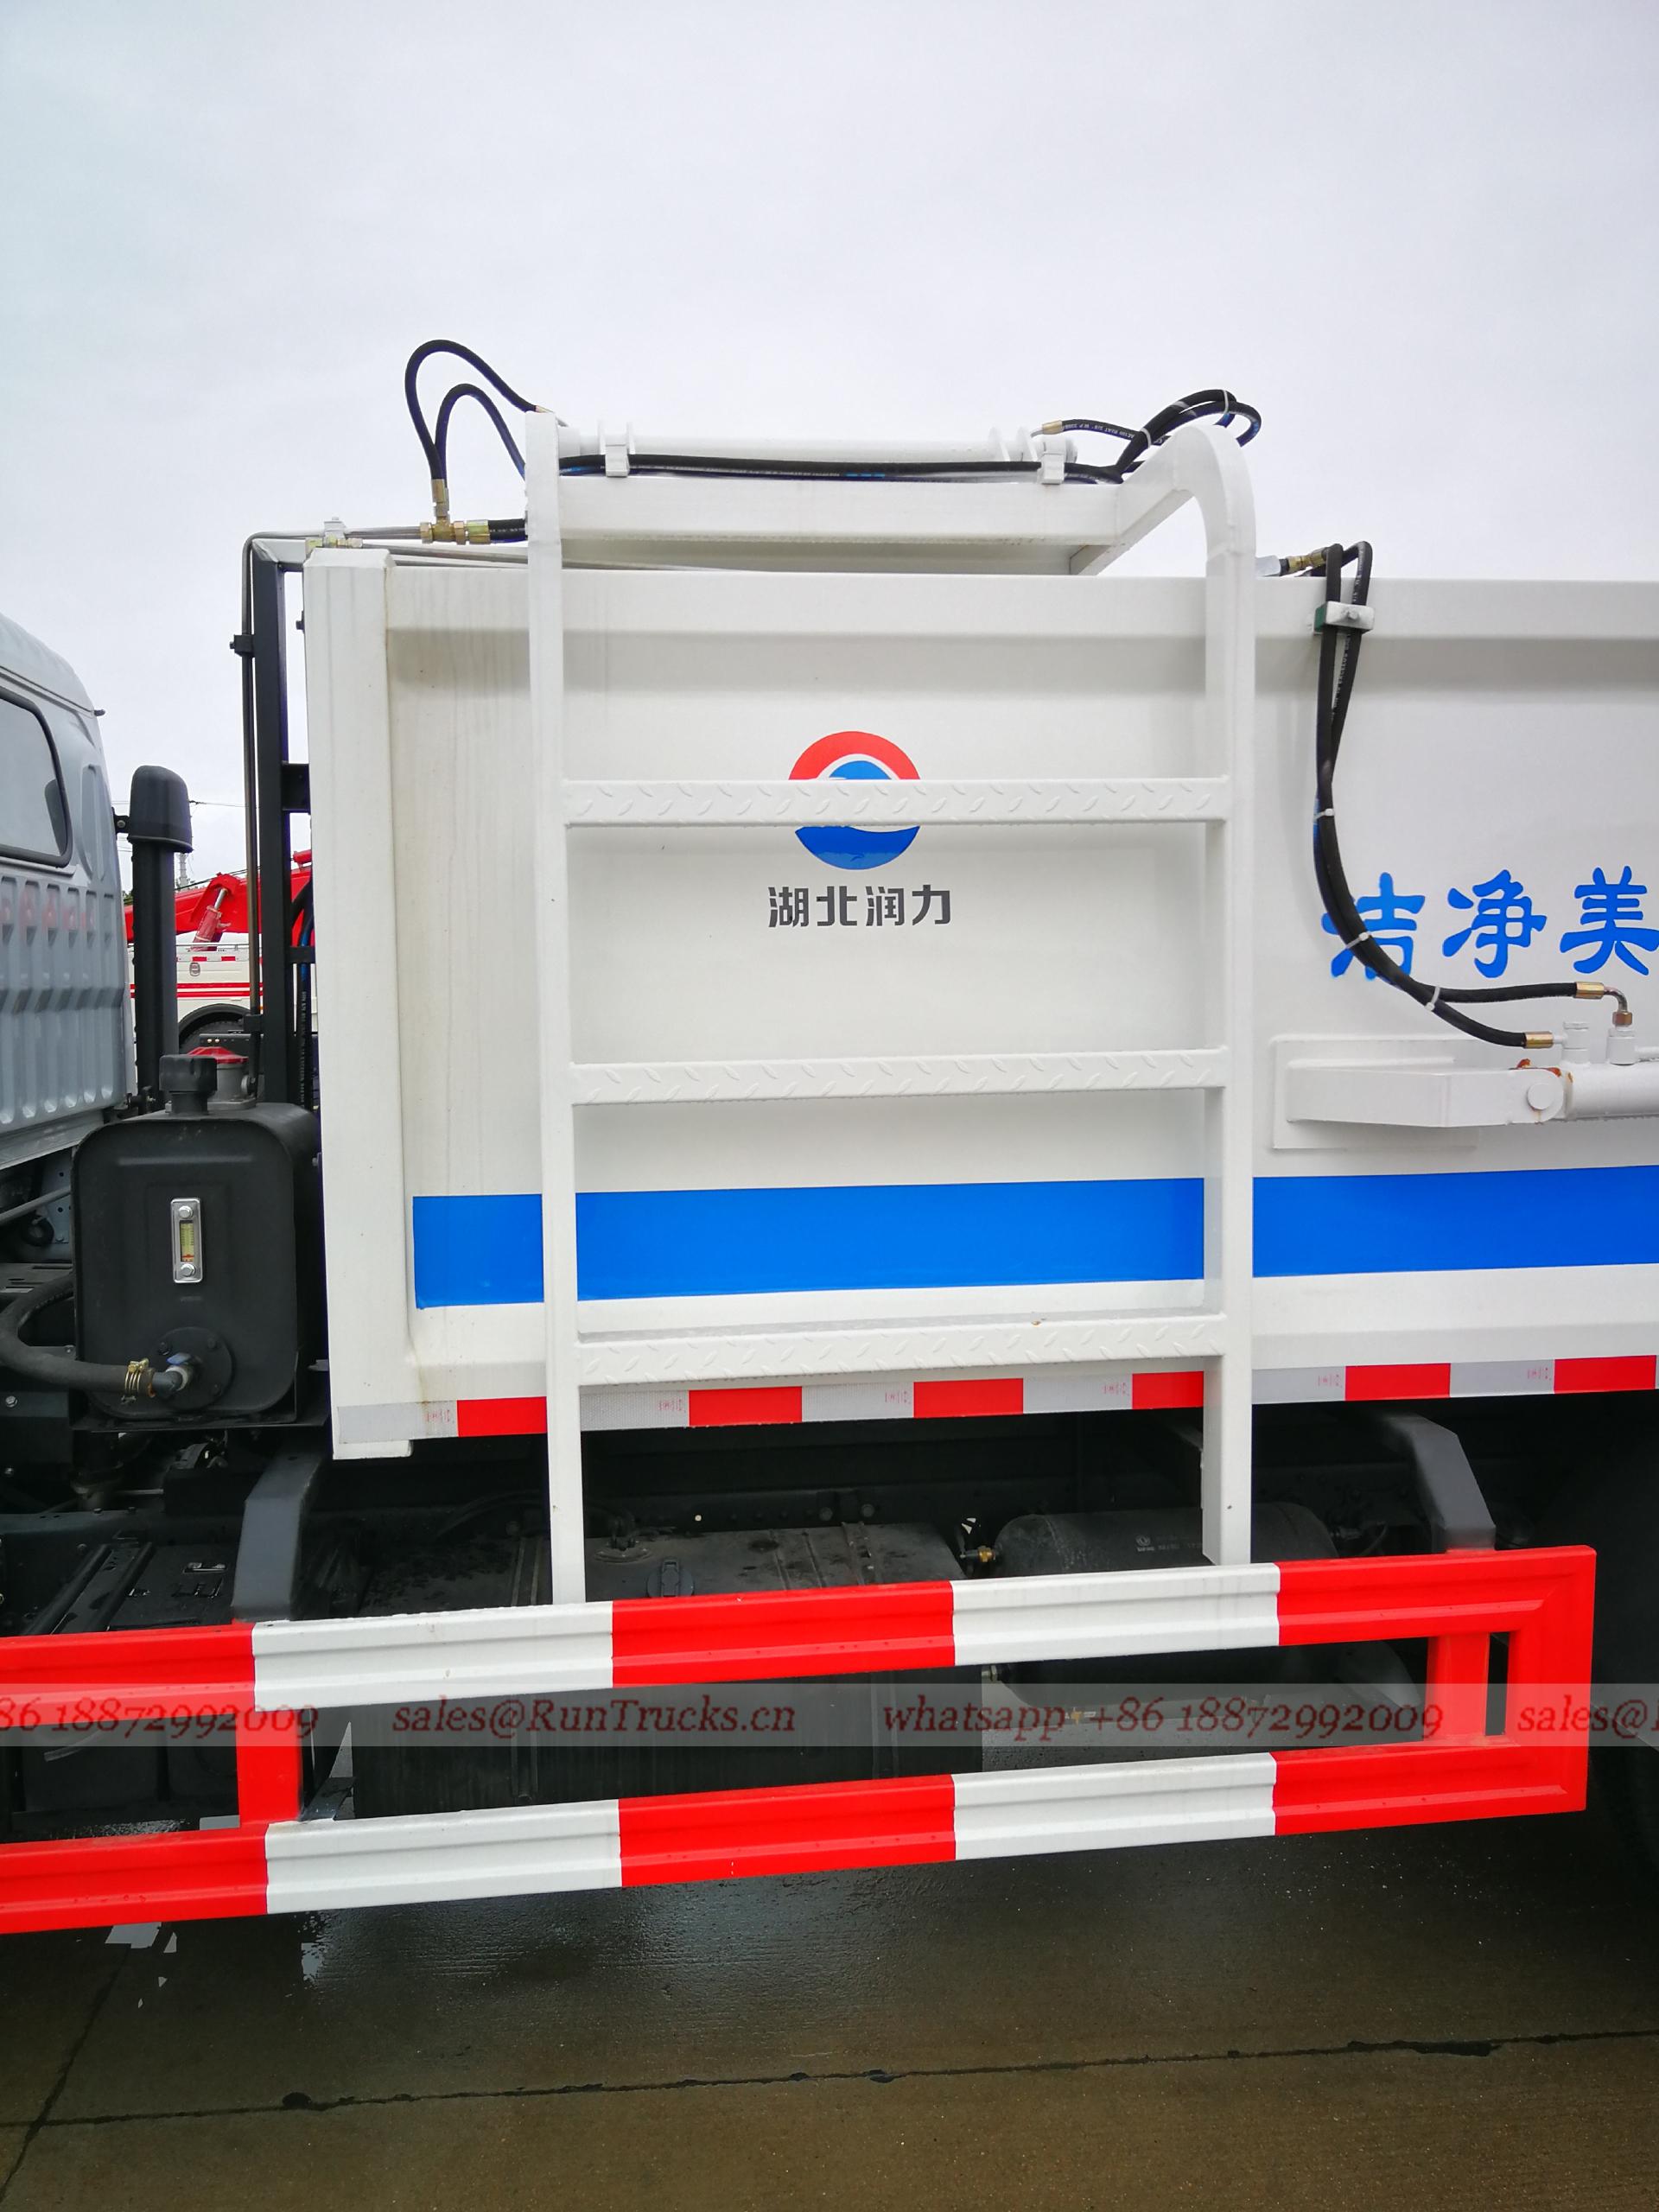 China Dongfeng 5 cbm lateral de carga hidráulica cubo colgan